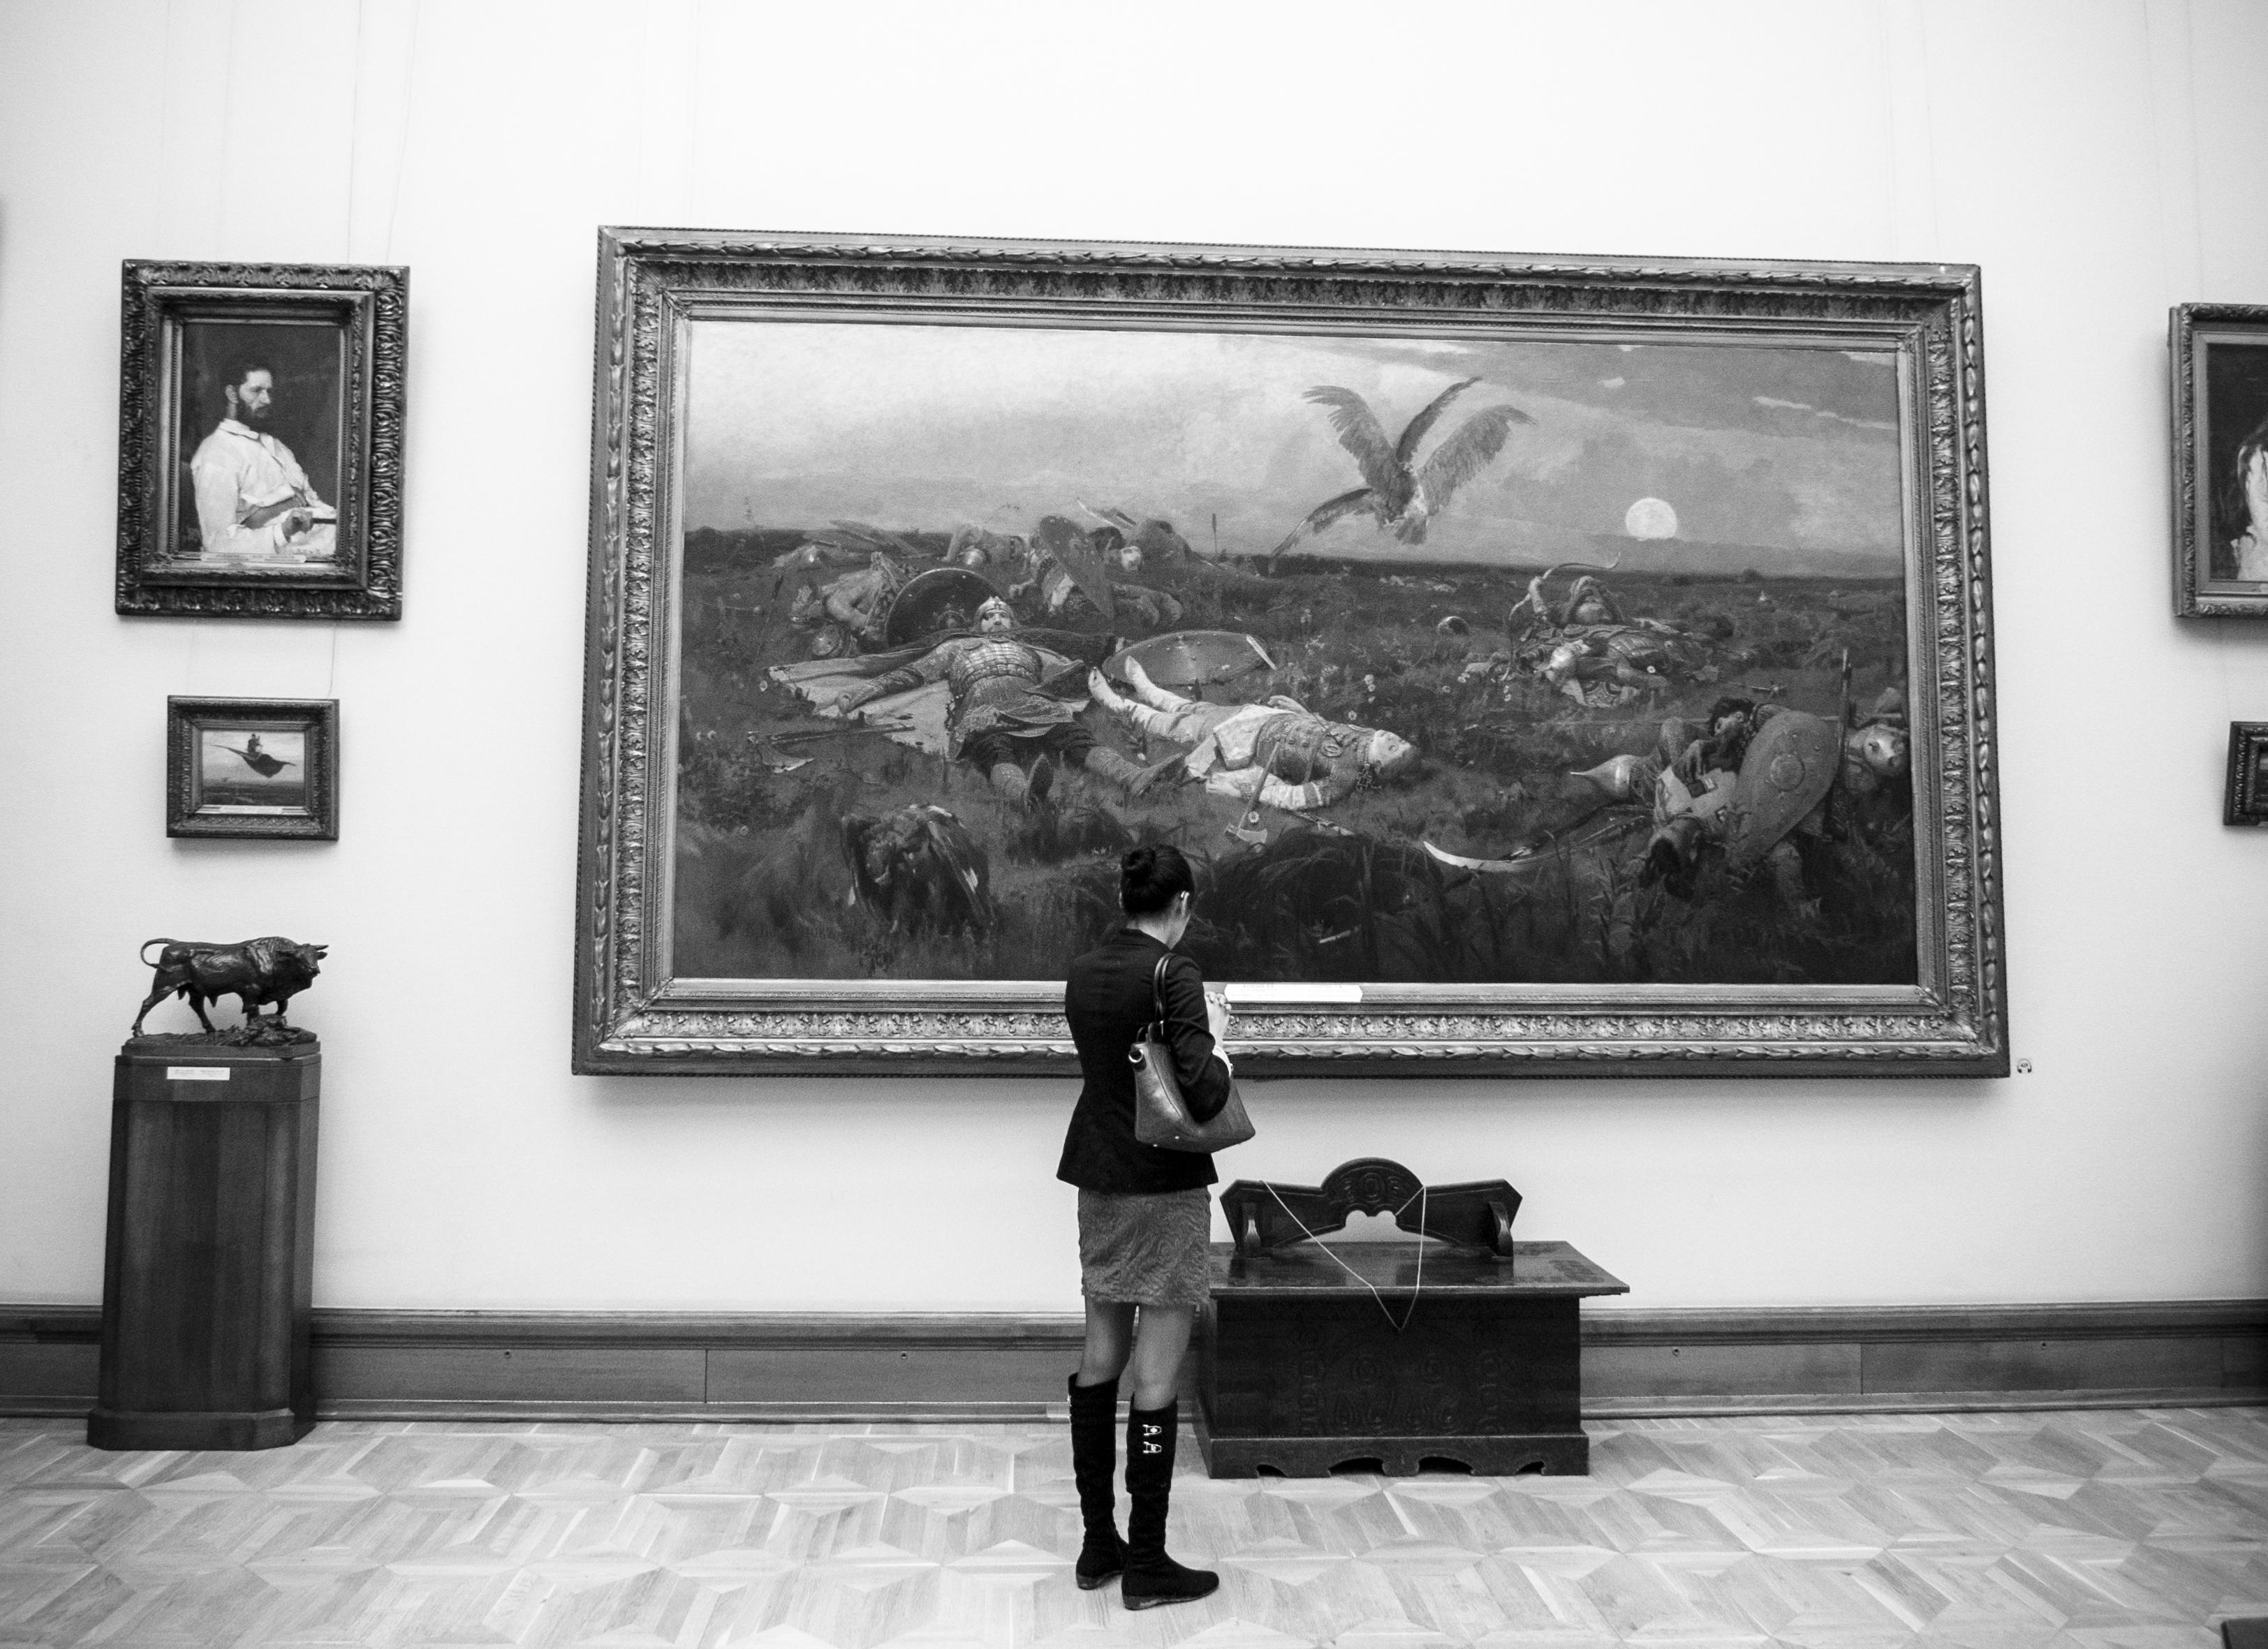 Fondos de pantalla pintura monocromo pared fotograf a for Disenos de interiores en blanco y negro